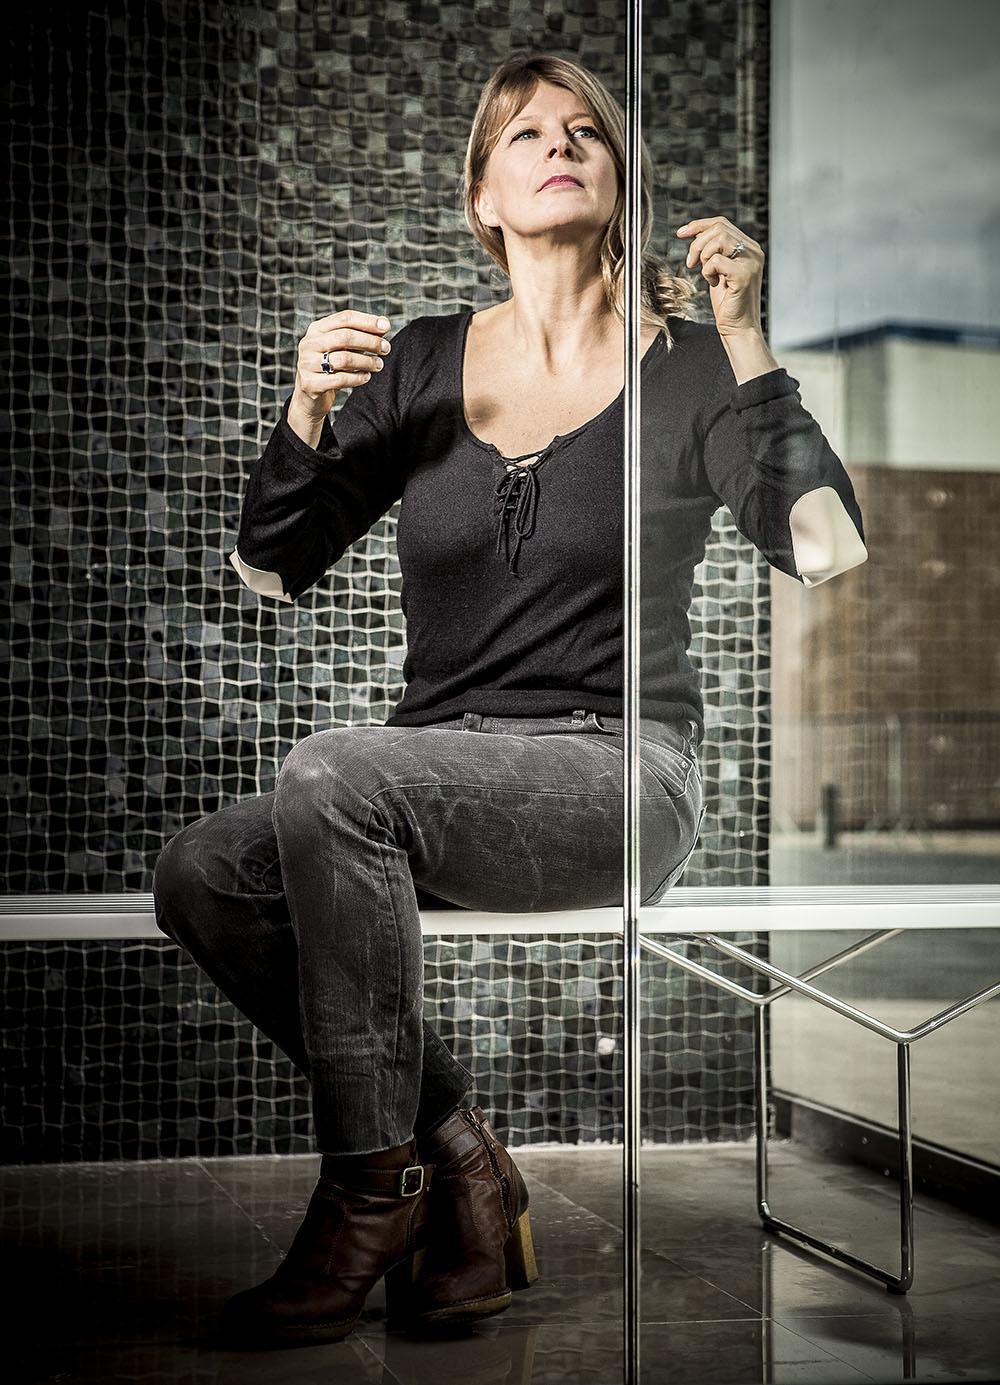 103-Sonia-Kronlund.jpg